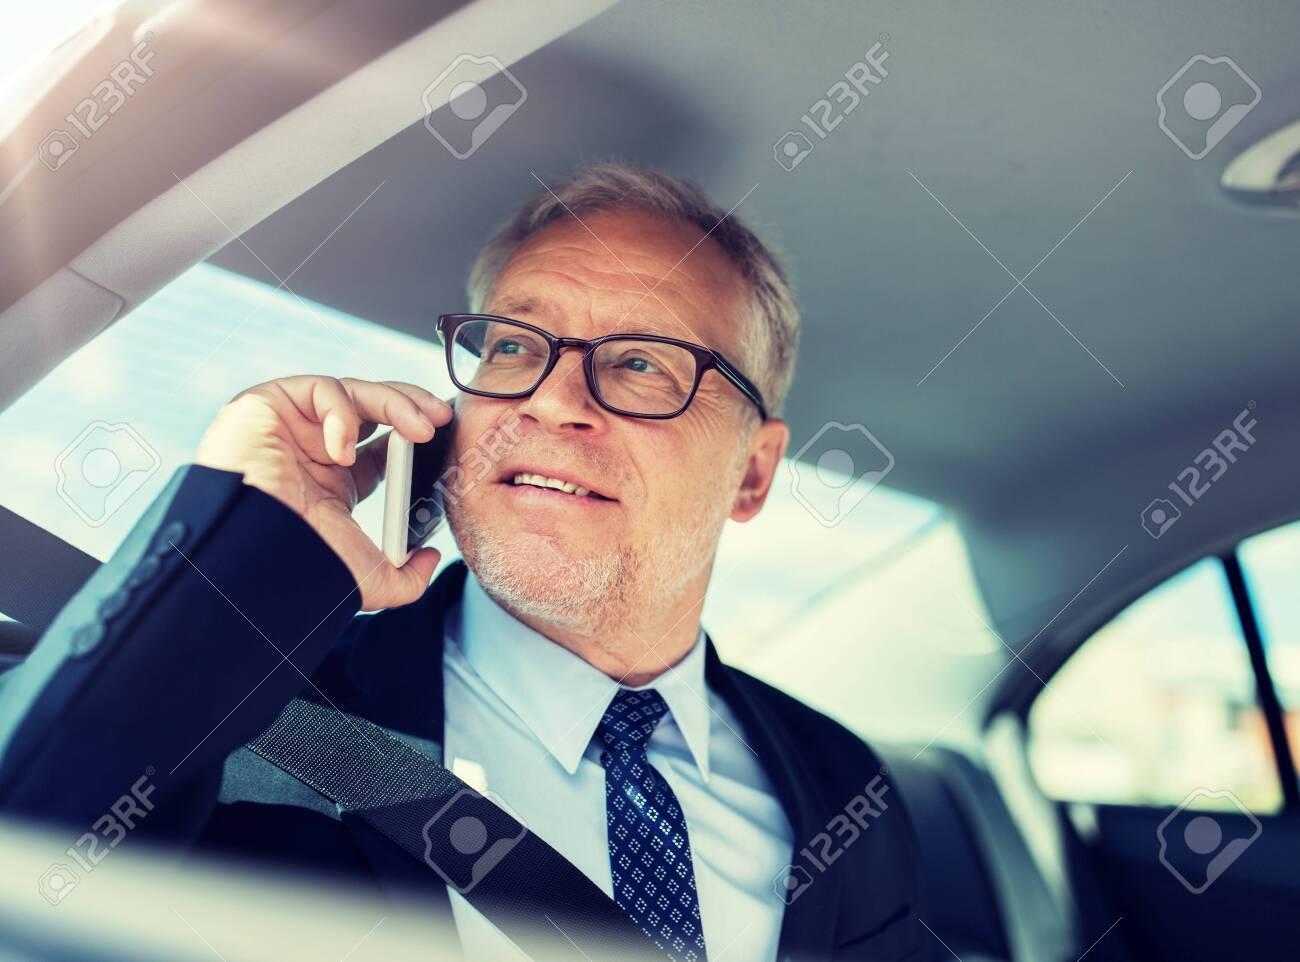 senior businessman calling on smartphone in car - 124309646